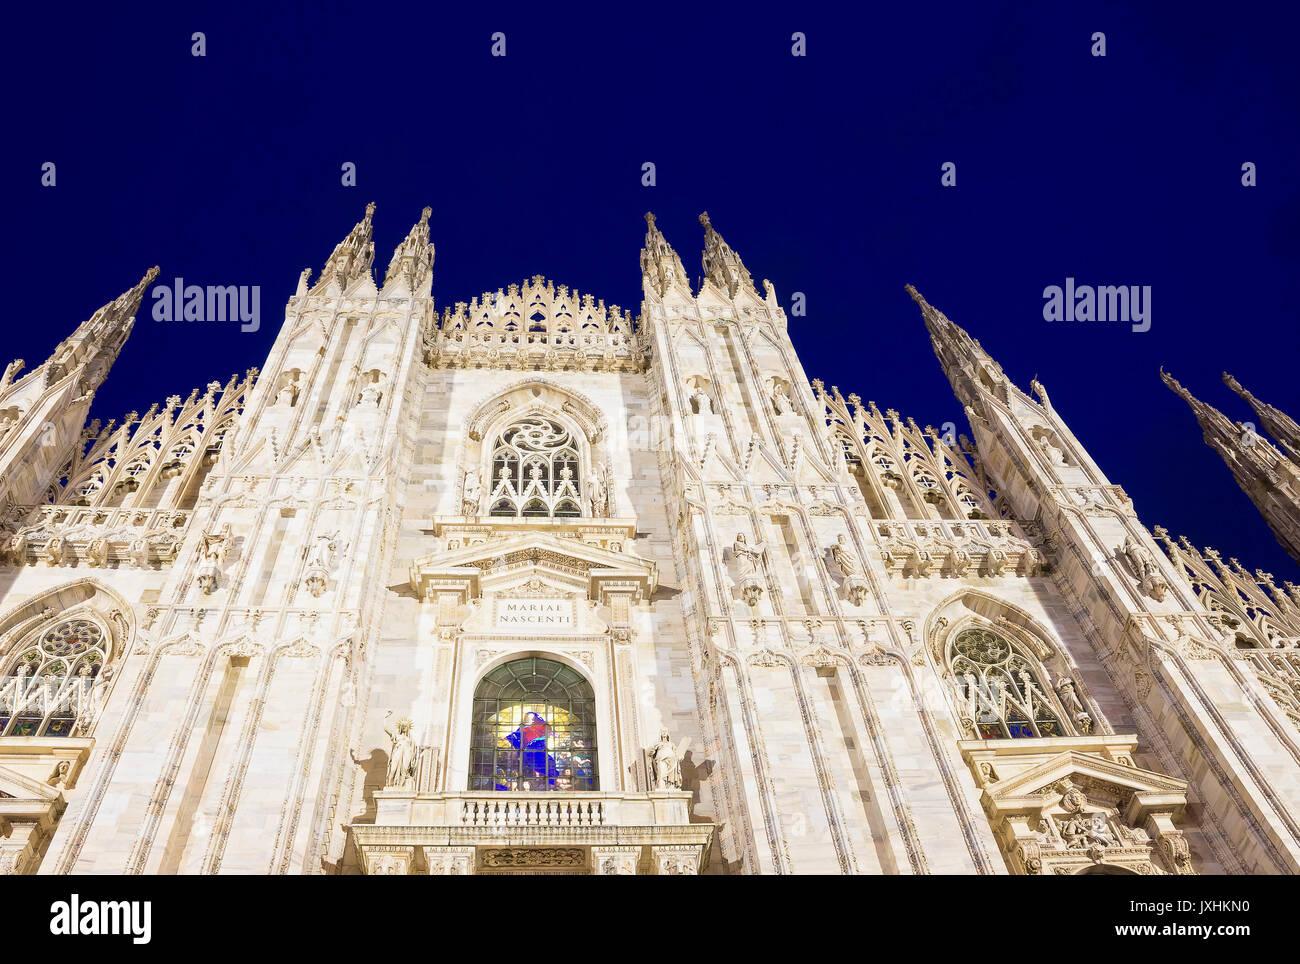 Night view of Milan Cathedral or Duomo di Milano - Stock Image